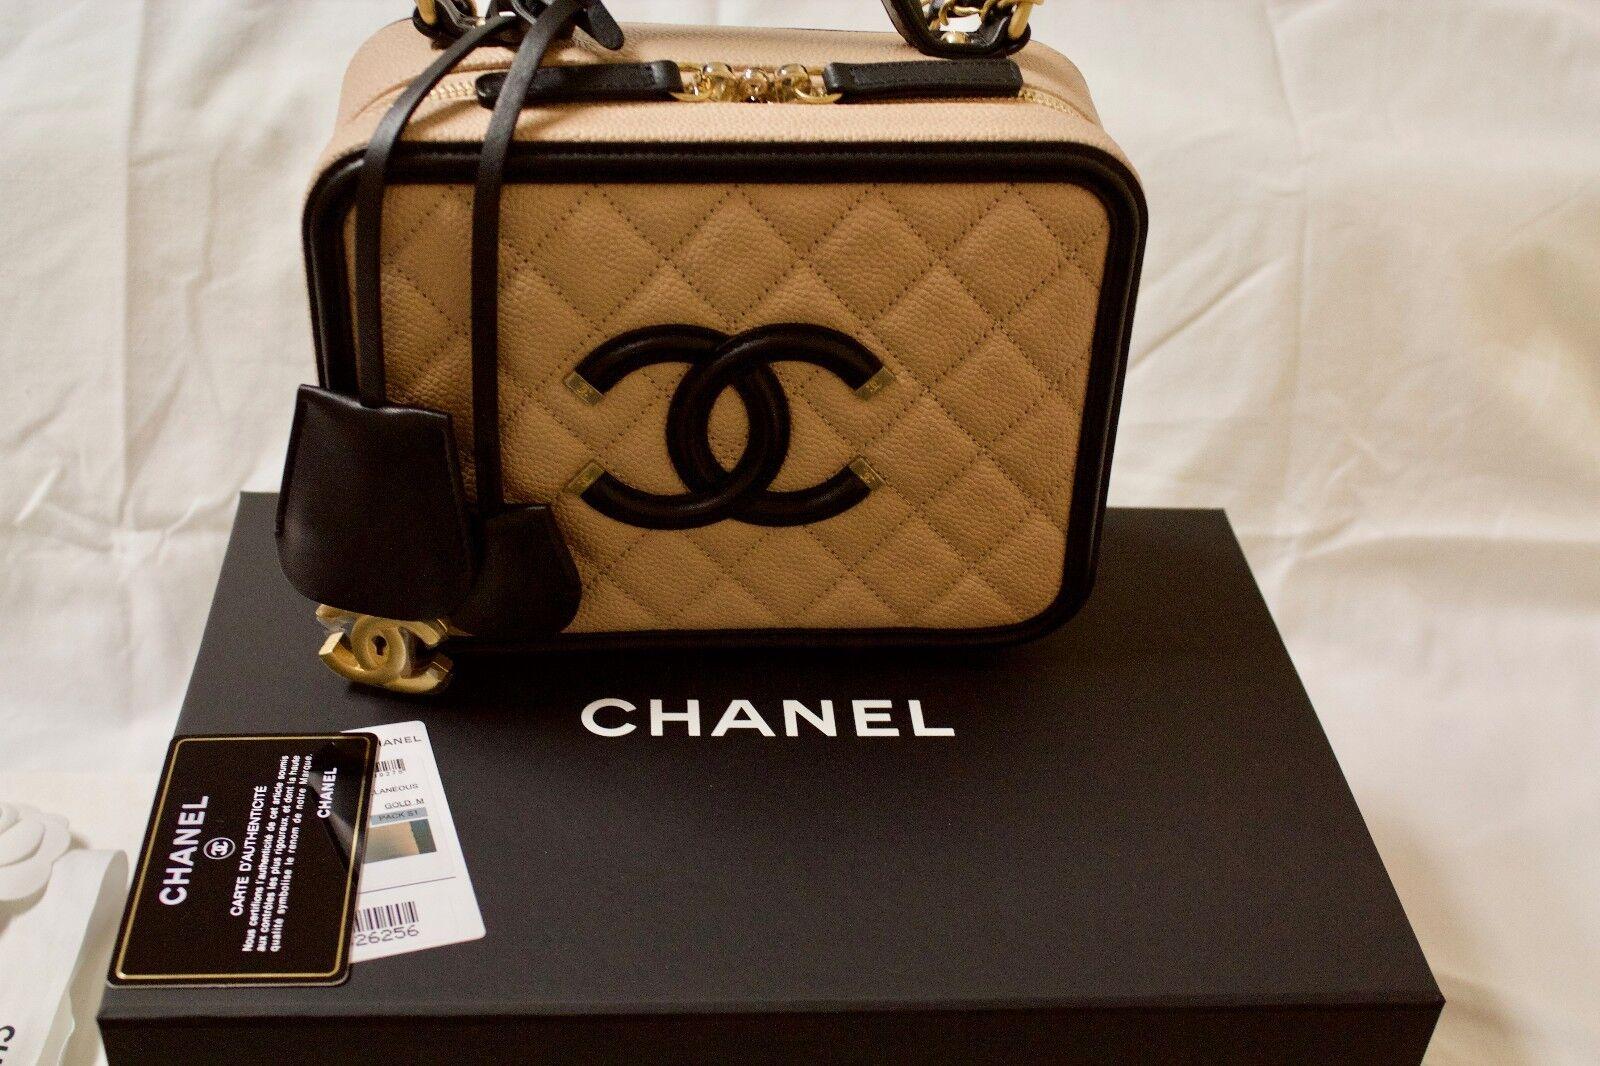 0d512bbfe386 CHANEL Filigree Vanity Beige Black Caviar Medium Bag Padlock 2 Keys - for  sale online